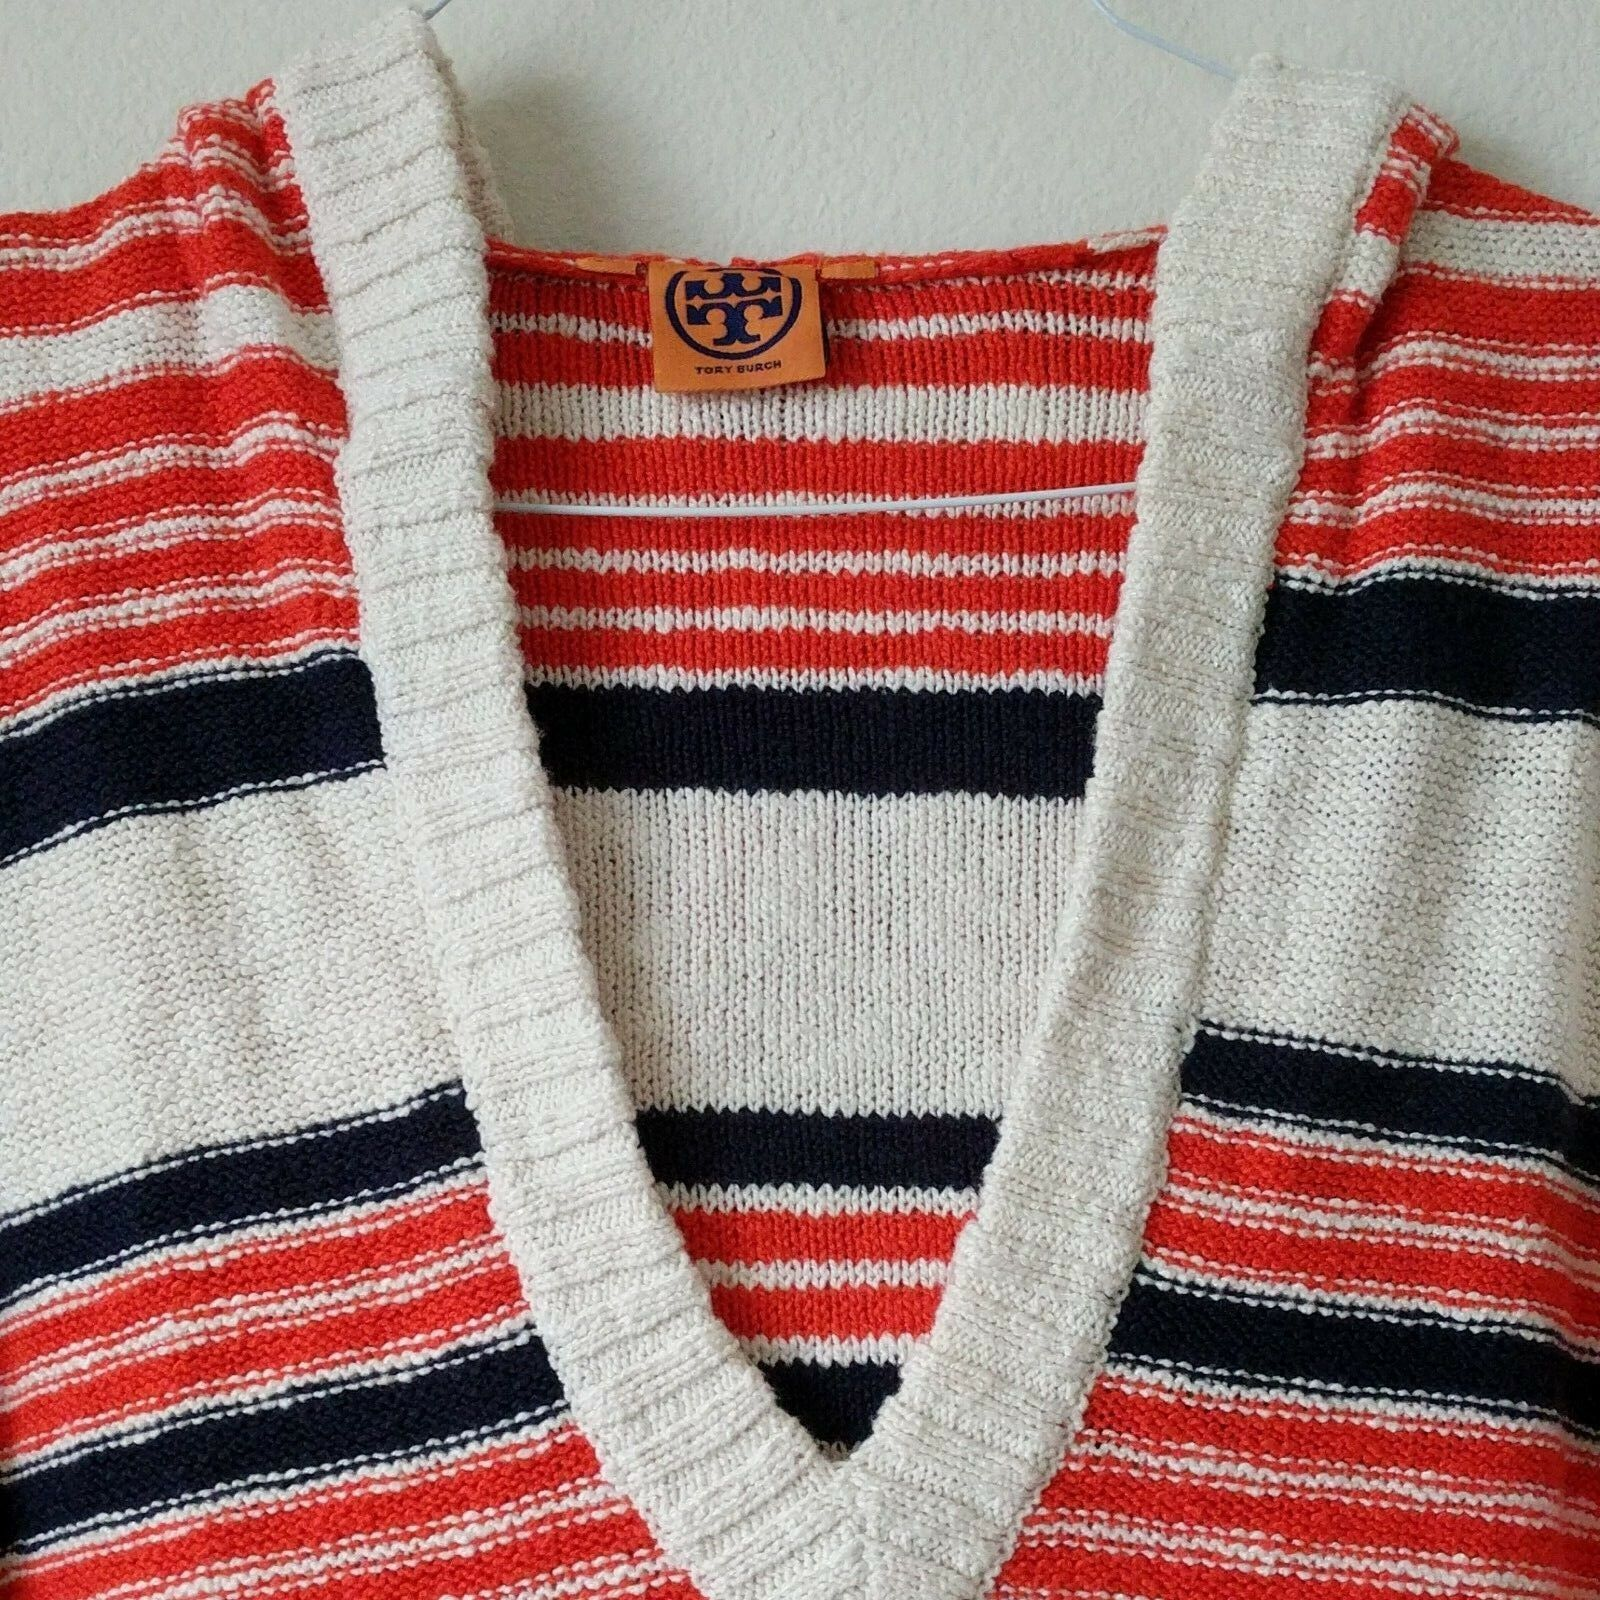 Tory Burch Womens Large Sweater Sweater Sweater orange White bluee Stripe Hood Knit Long Sleeves 7abe22